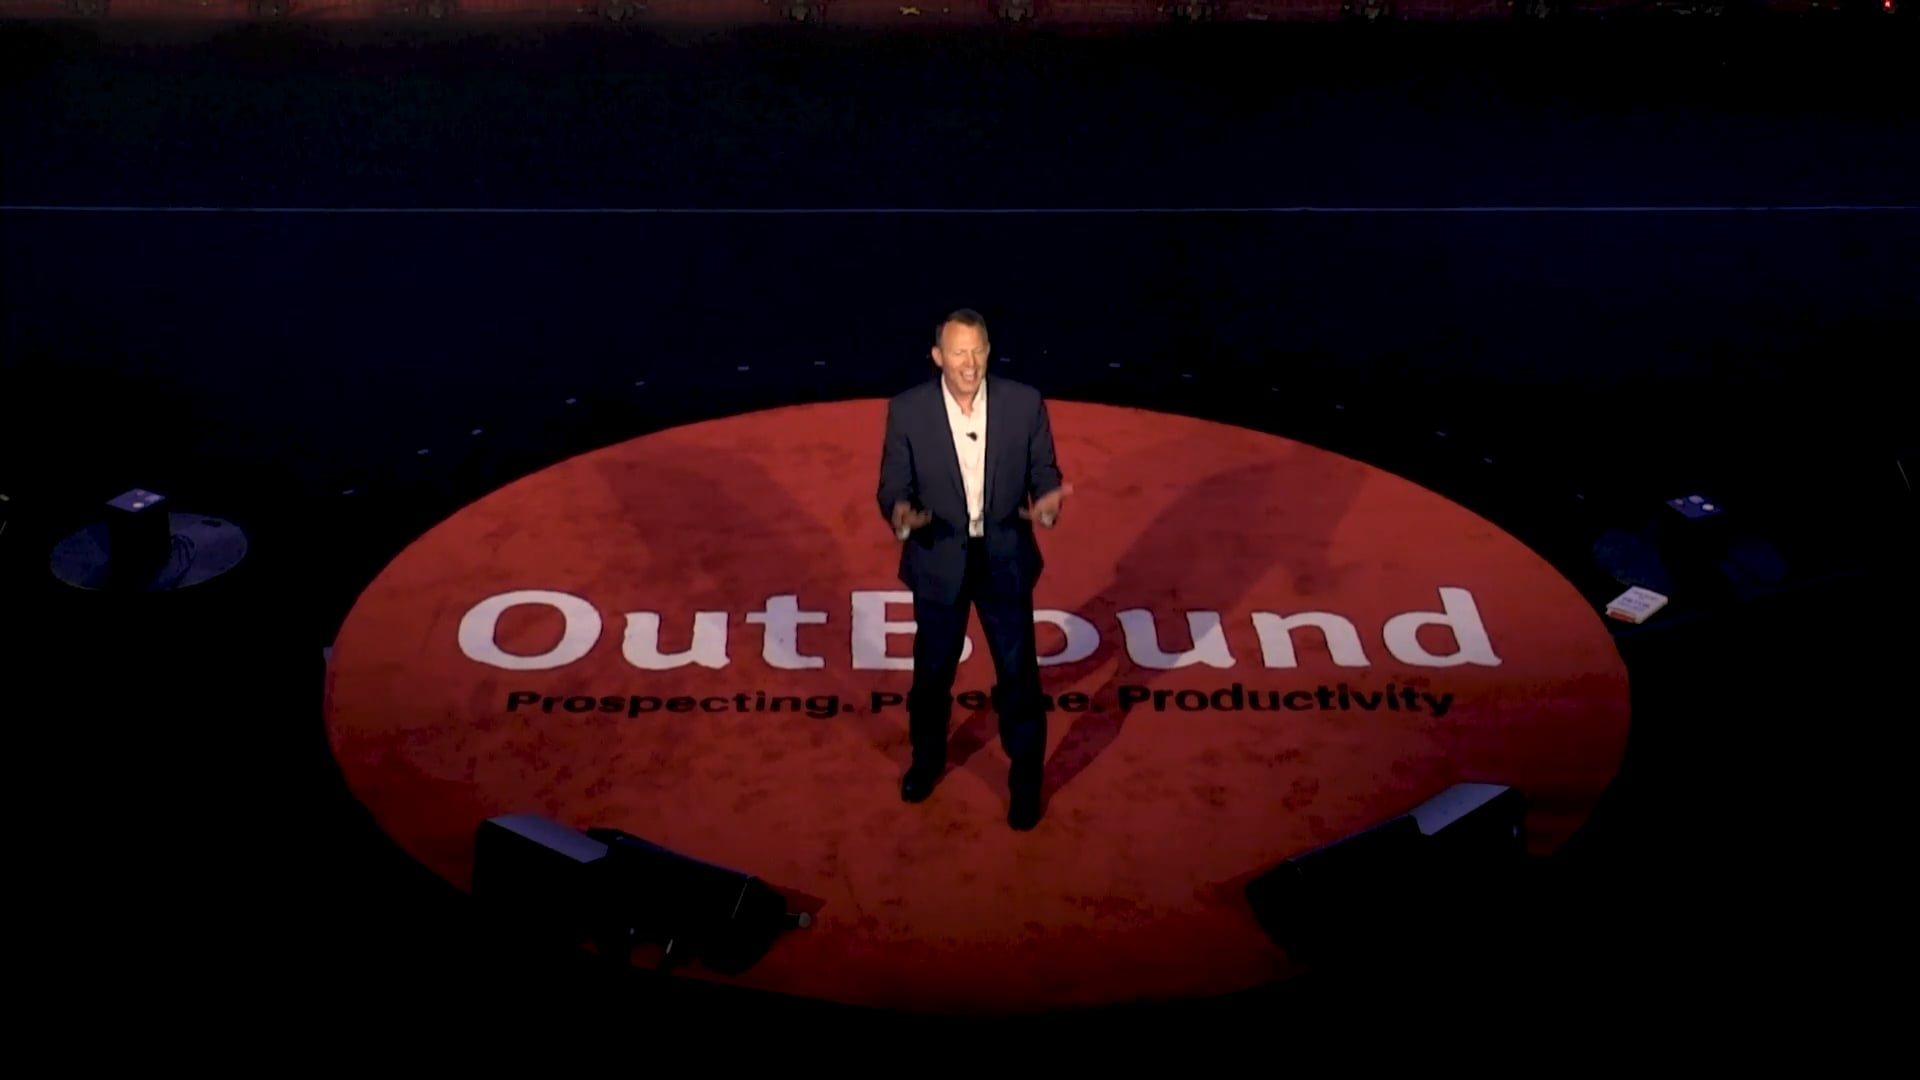 OutBound: James Muir